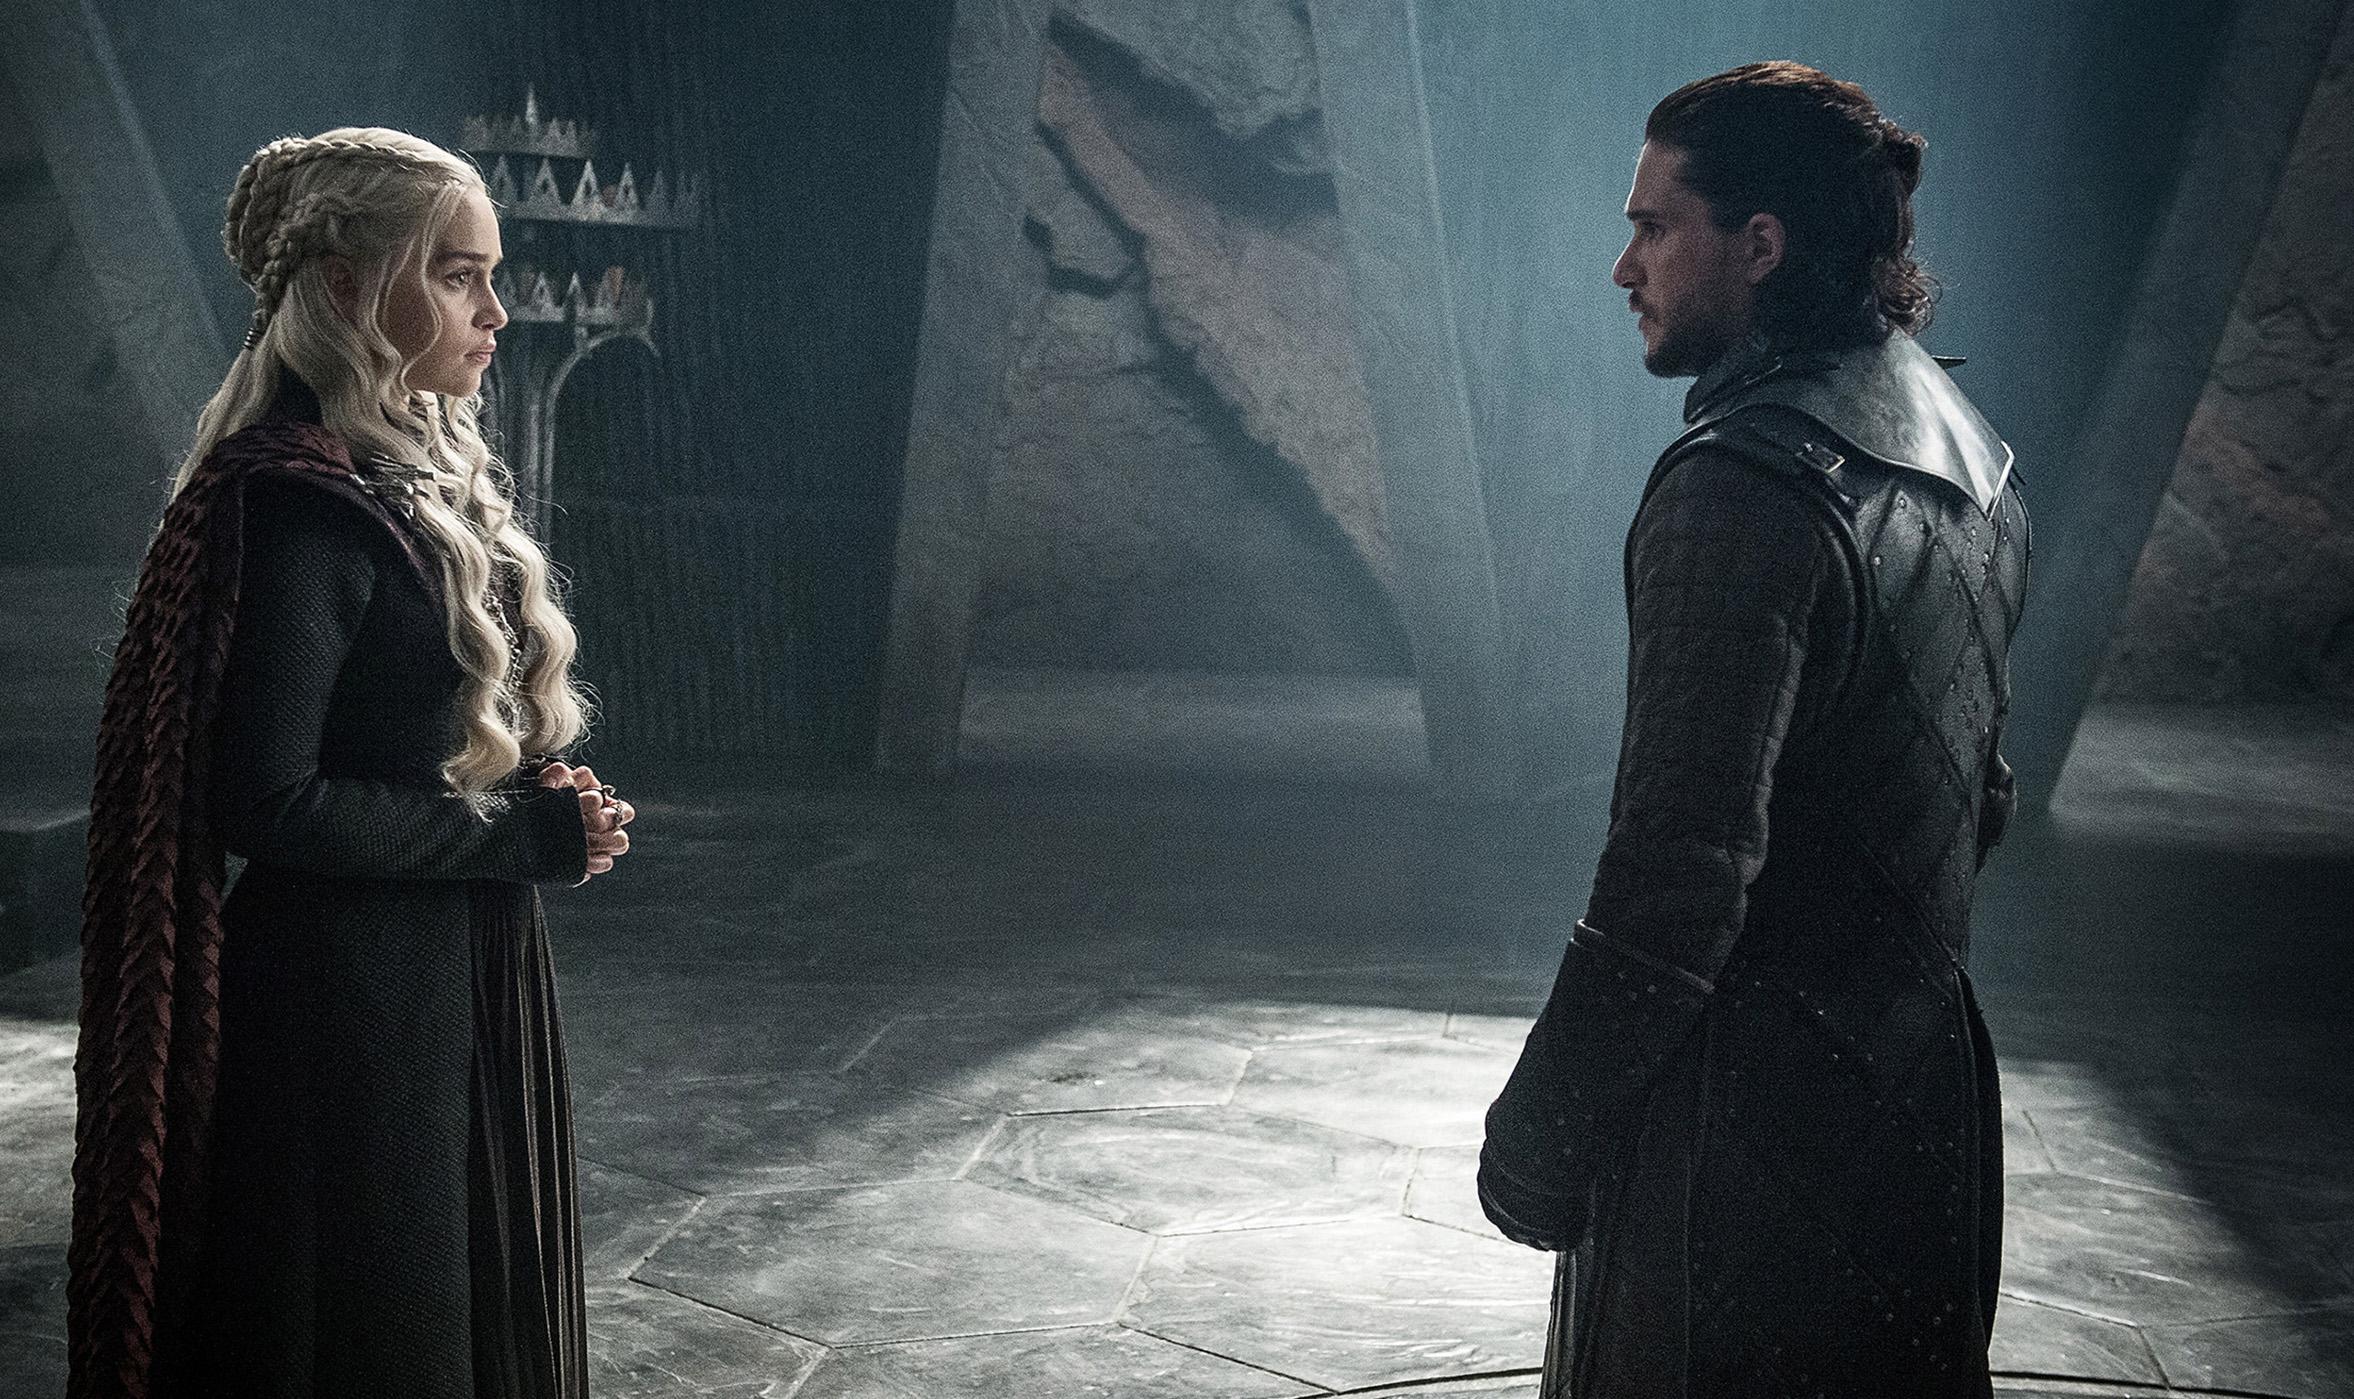 Game Of Thrones Season 8 Episode 6 Trailer Details Episode Guide And More Den Of Geek